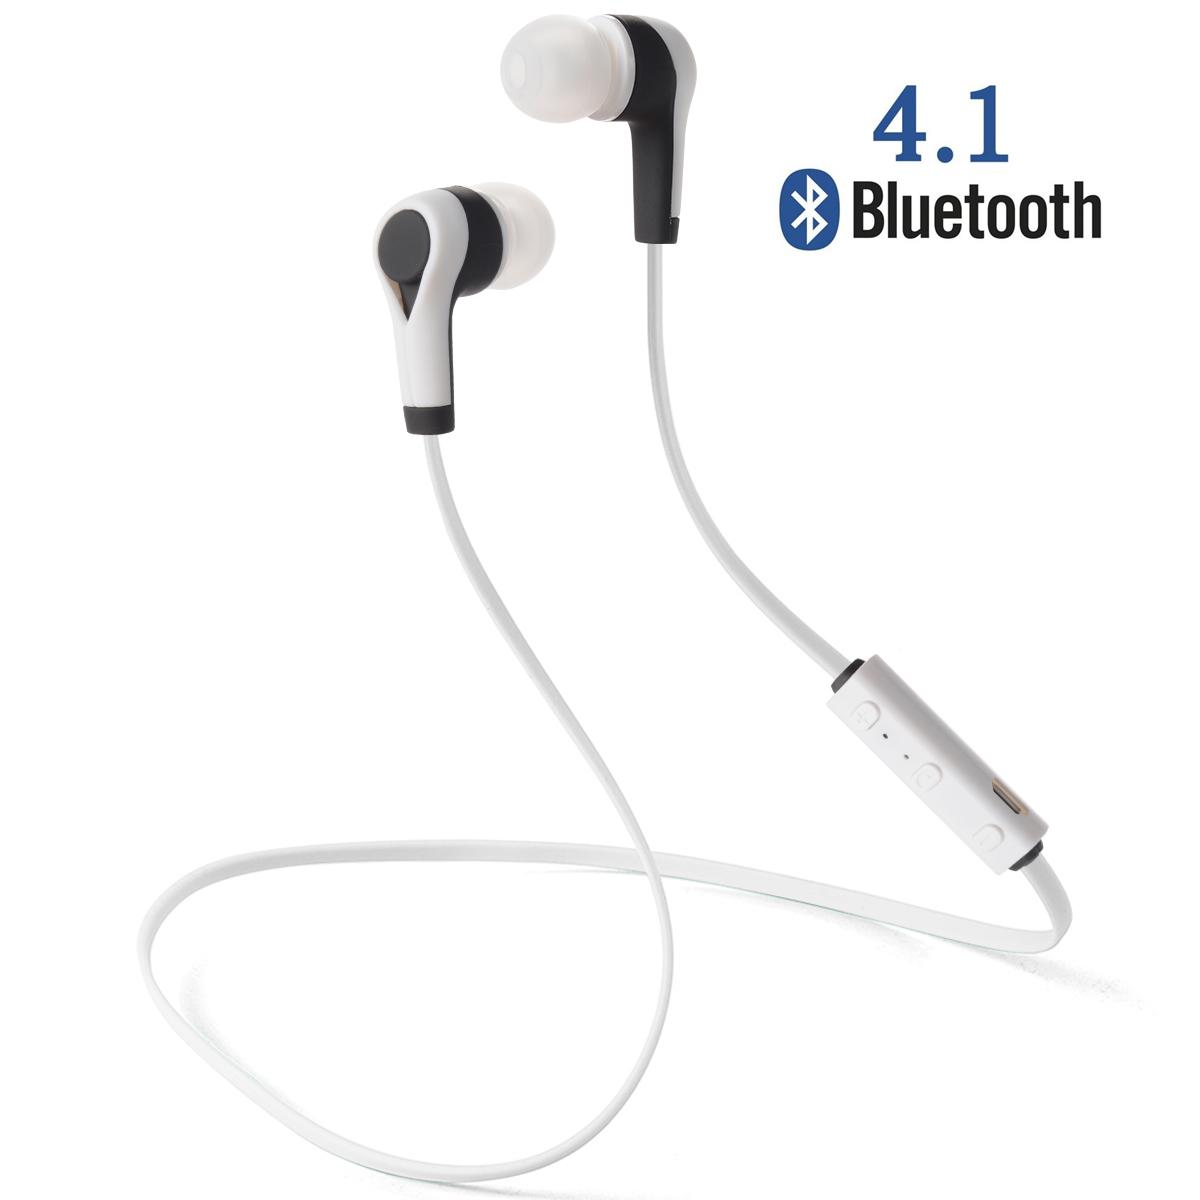 Bluetooth 4.1 Wireless Sweatproof Earbuds Headset Earphone Sport TH174(China (Mainland))